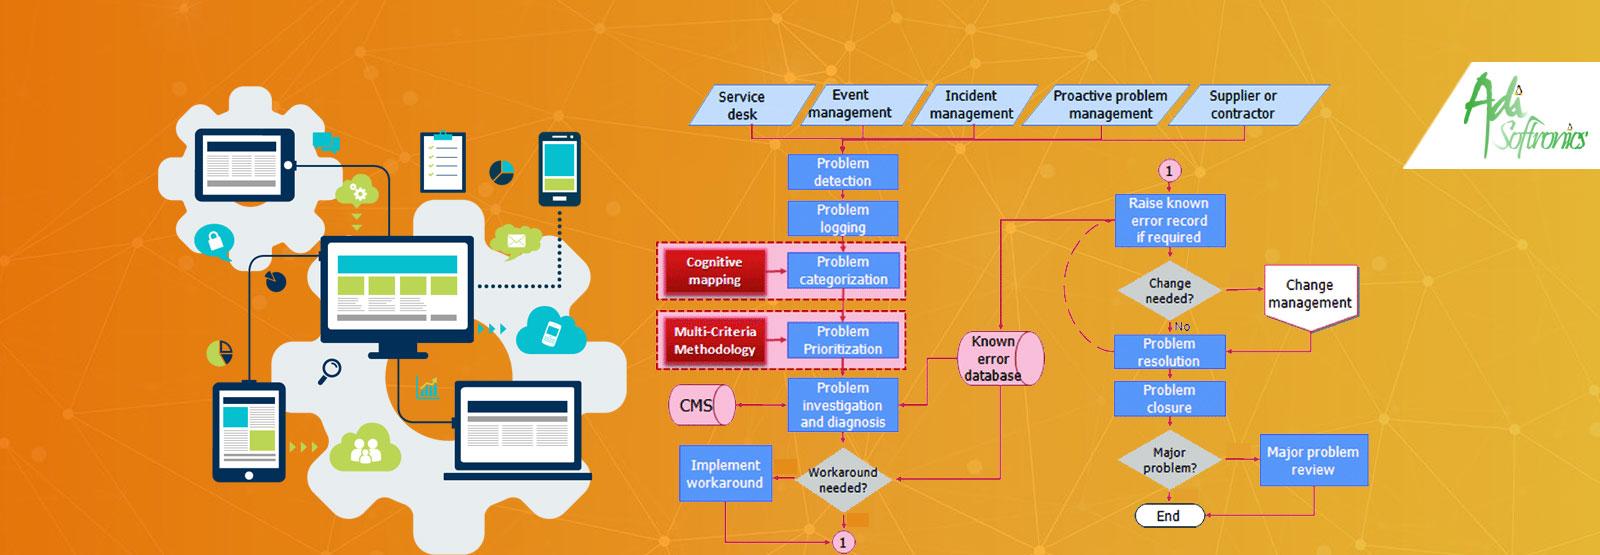 process flow management software development